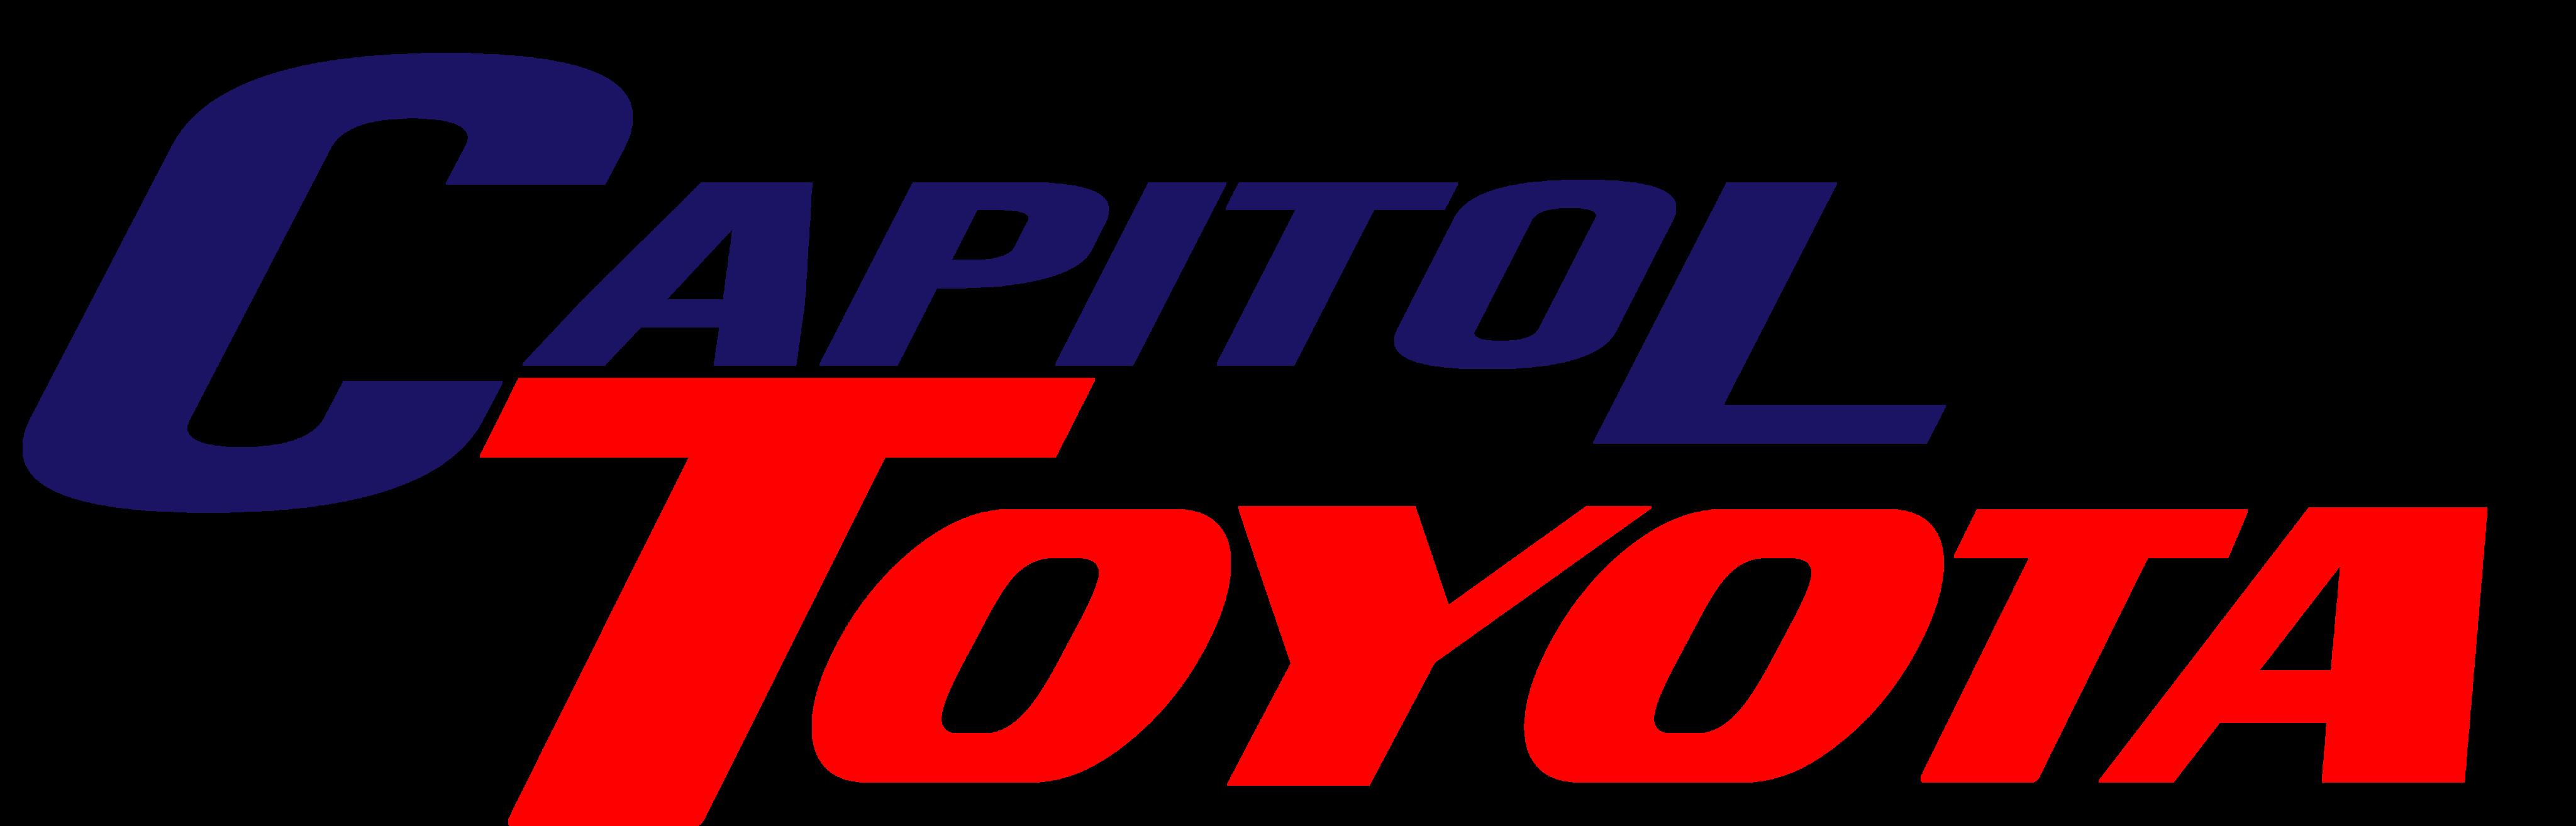 Capitol Toyota San Jose Corolla Highlander Tacoma Camry Radio Wiring Harness On Jbl Get Or Rav4